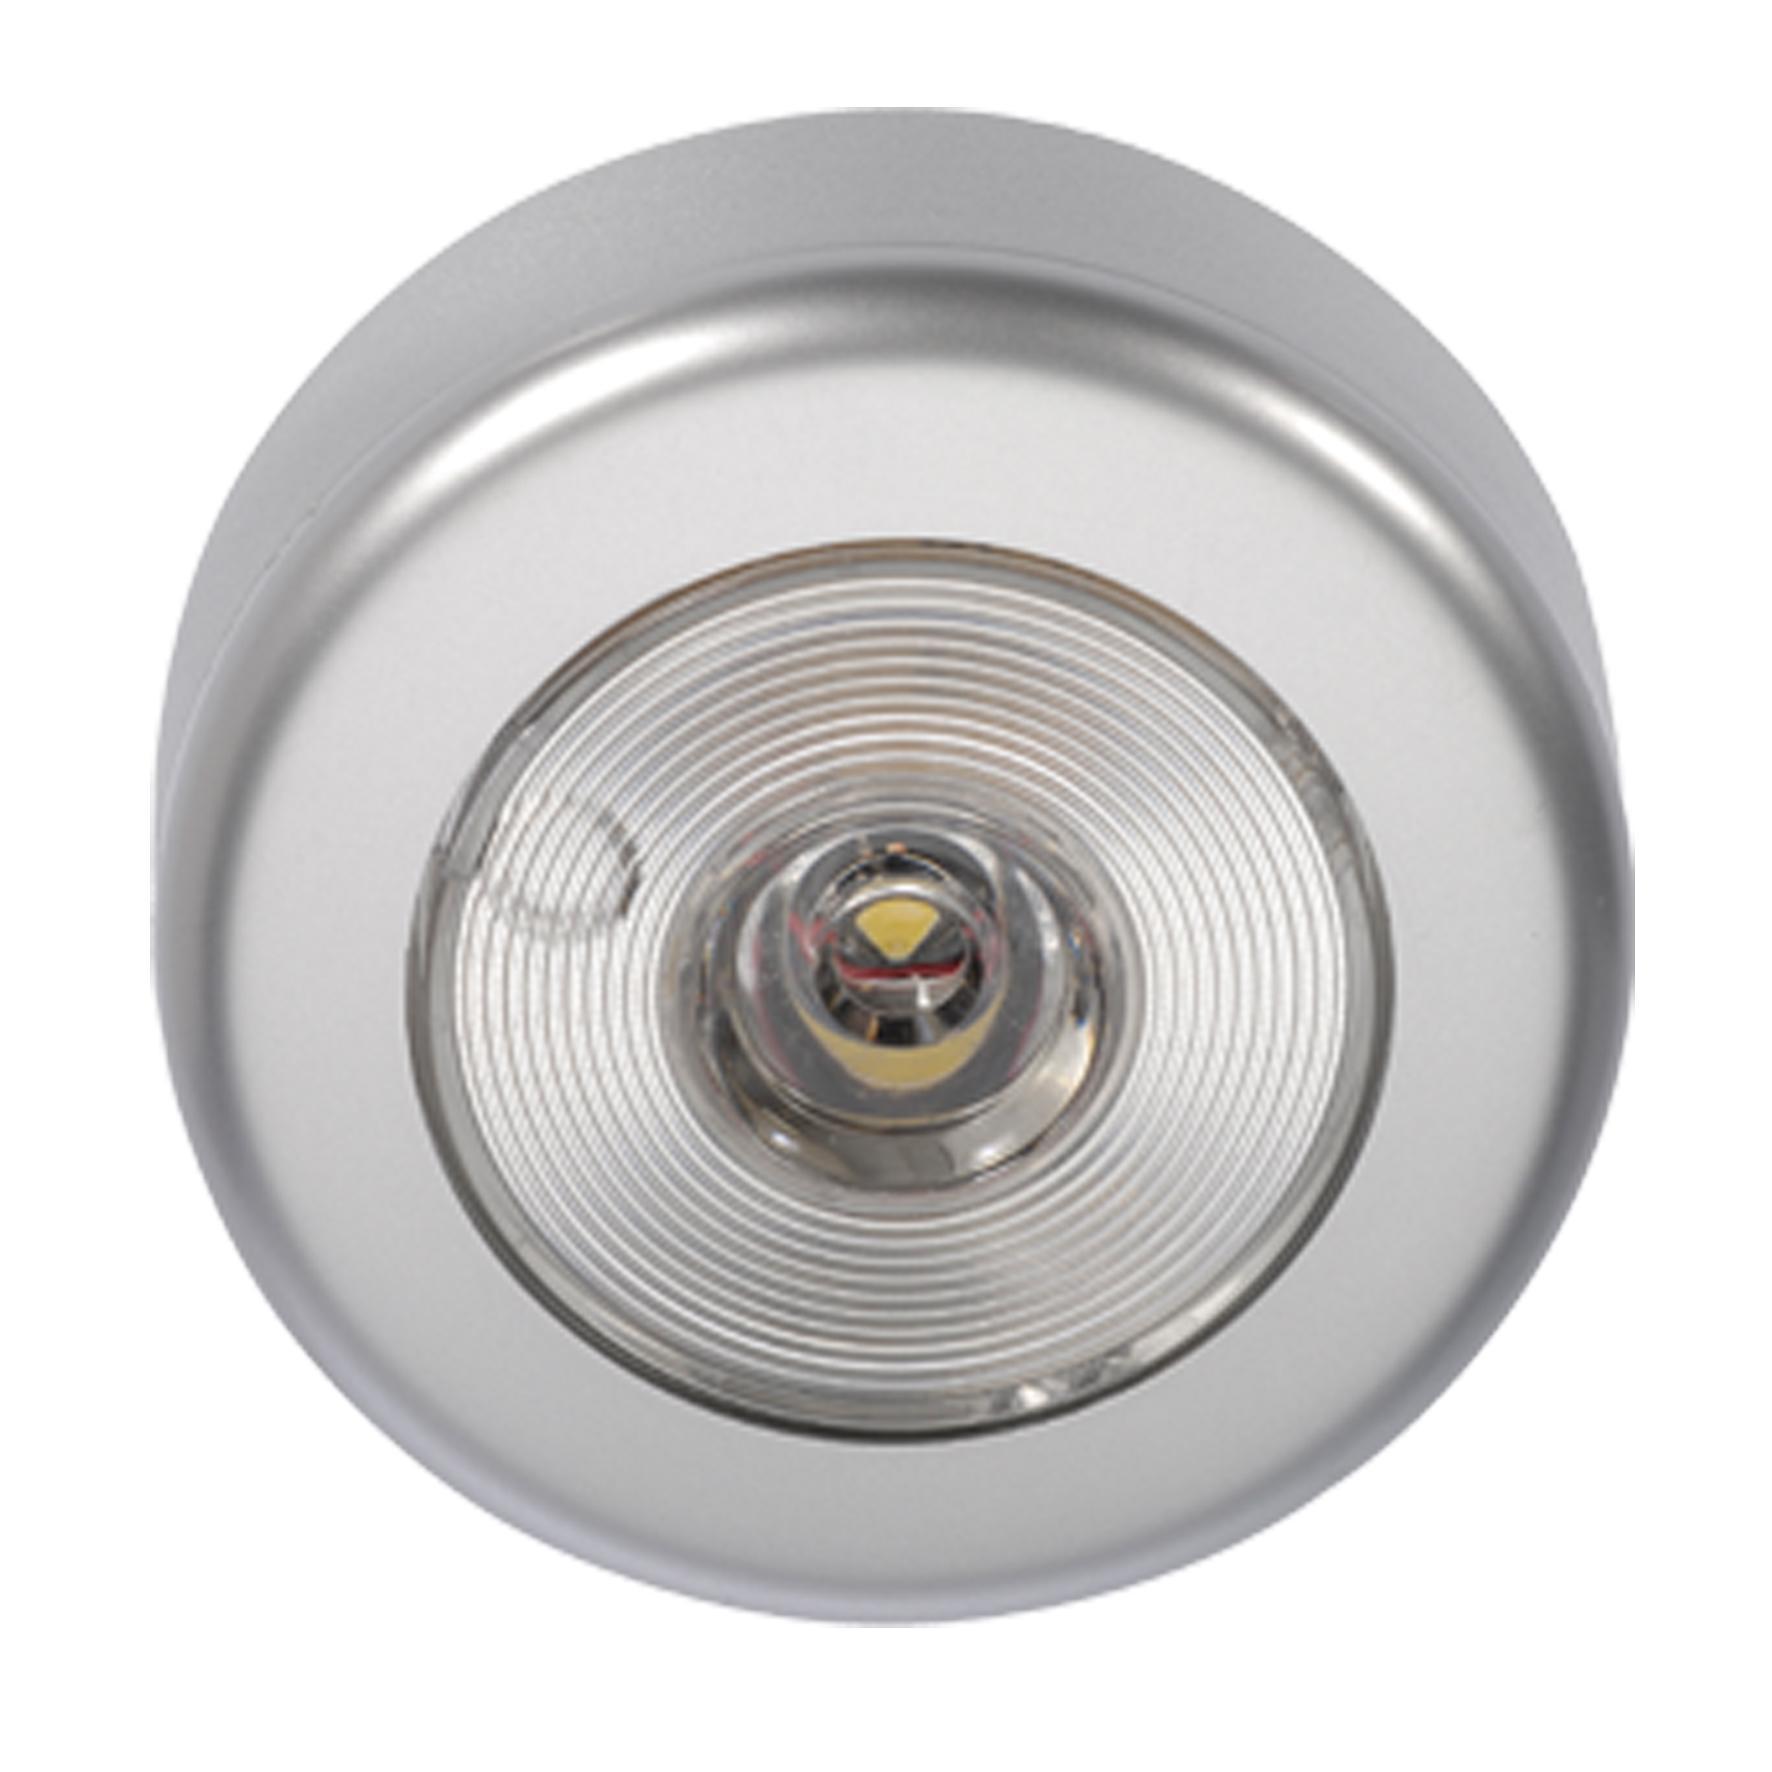 Narva 10 30 Volt L E D Courtesy Strip Lamp: Narva 10-30 Volt 1W L.E.D Courtesy Lamp With Off/On Switch